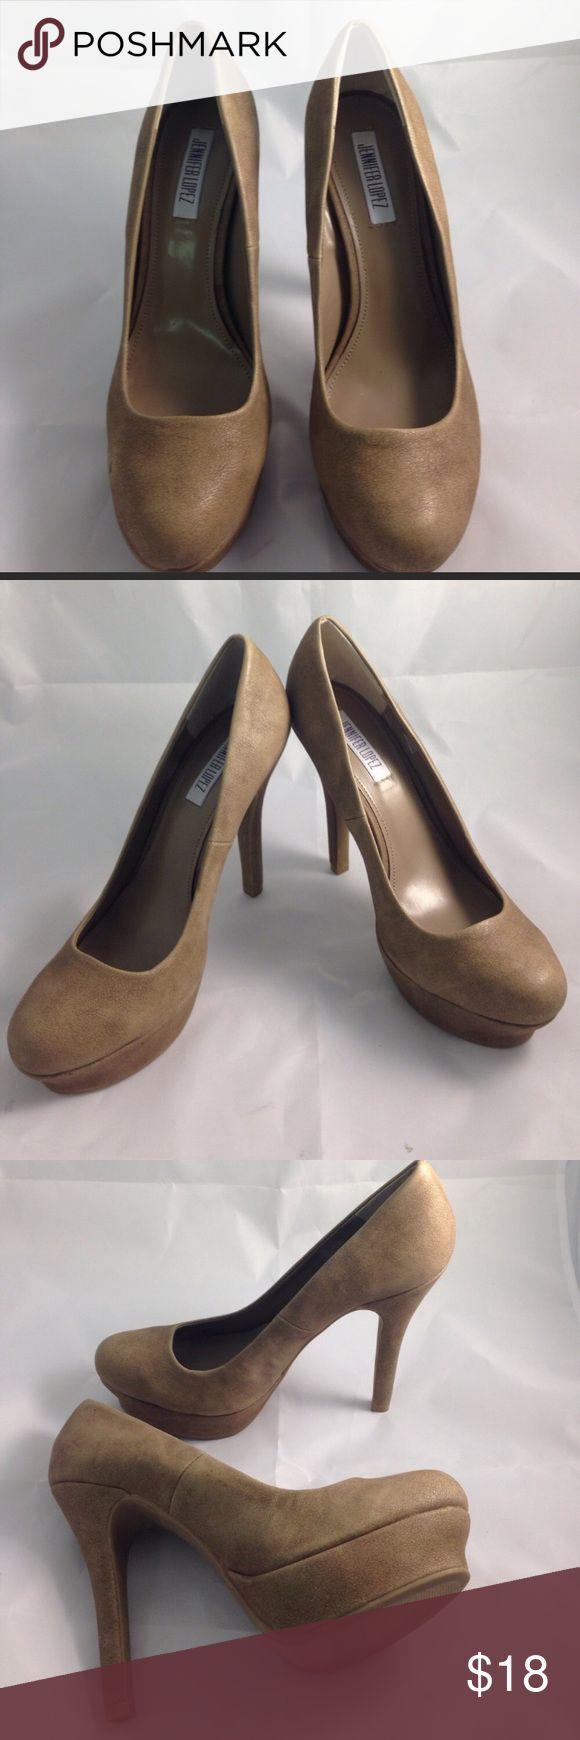 Jennifer Lopez platform heels size 10 Good condition Jennifer Lopez Shoes Platforms